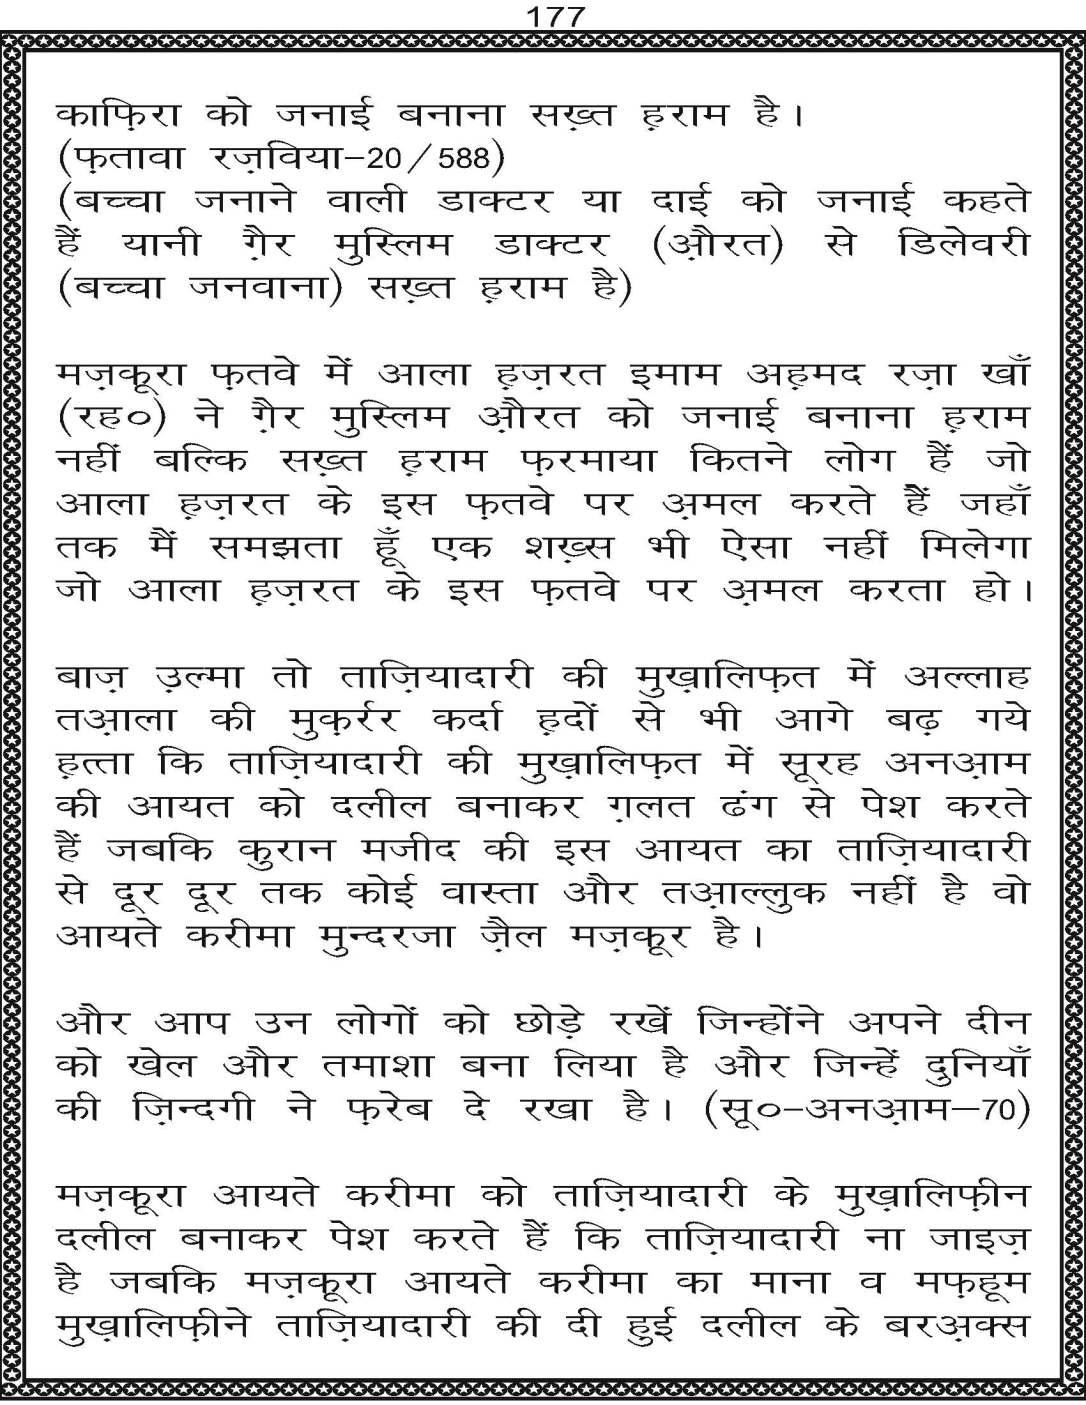 AzmateTaziyadari_Page_177